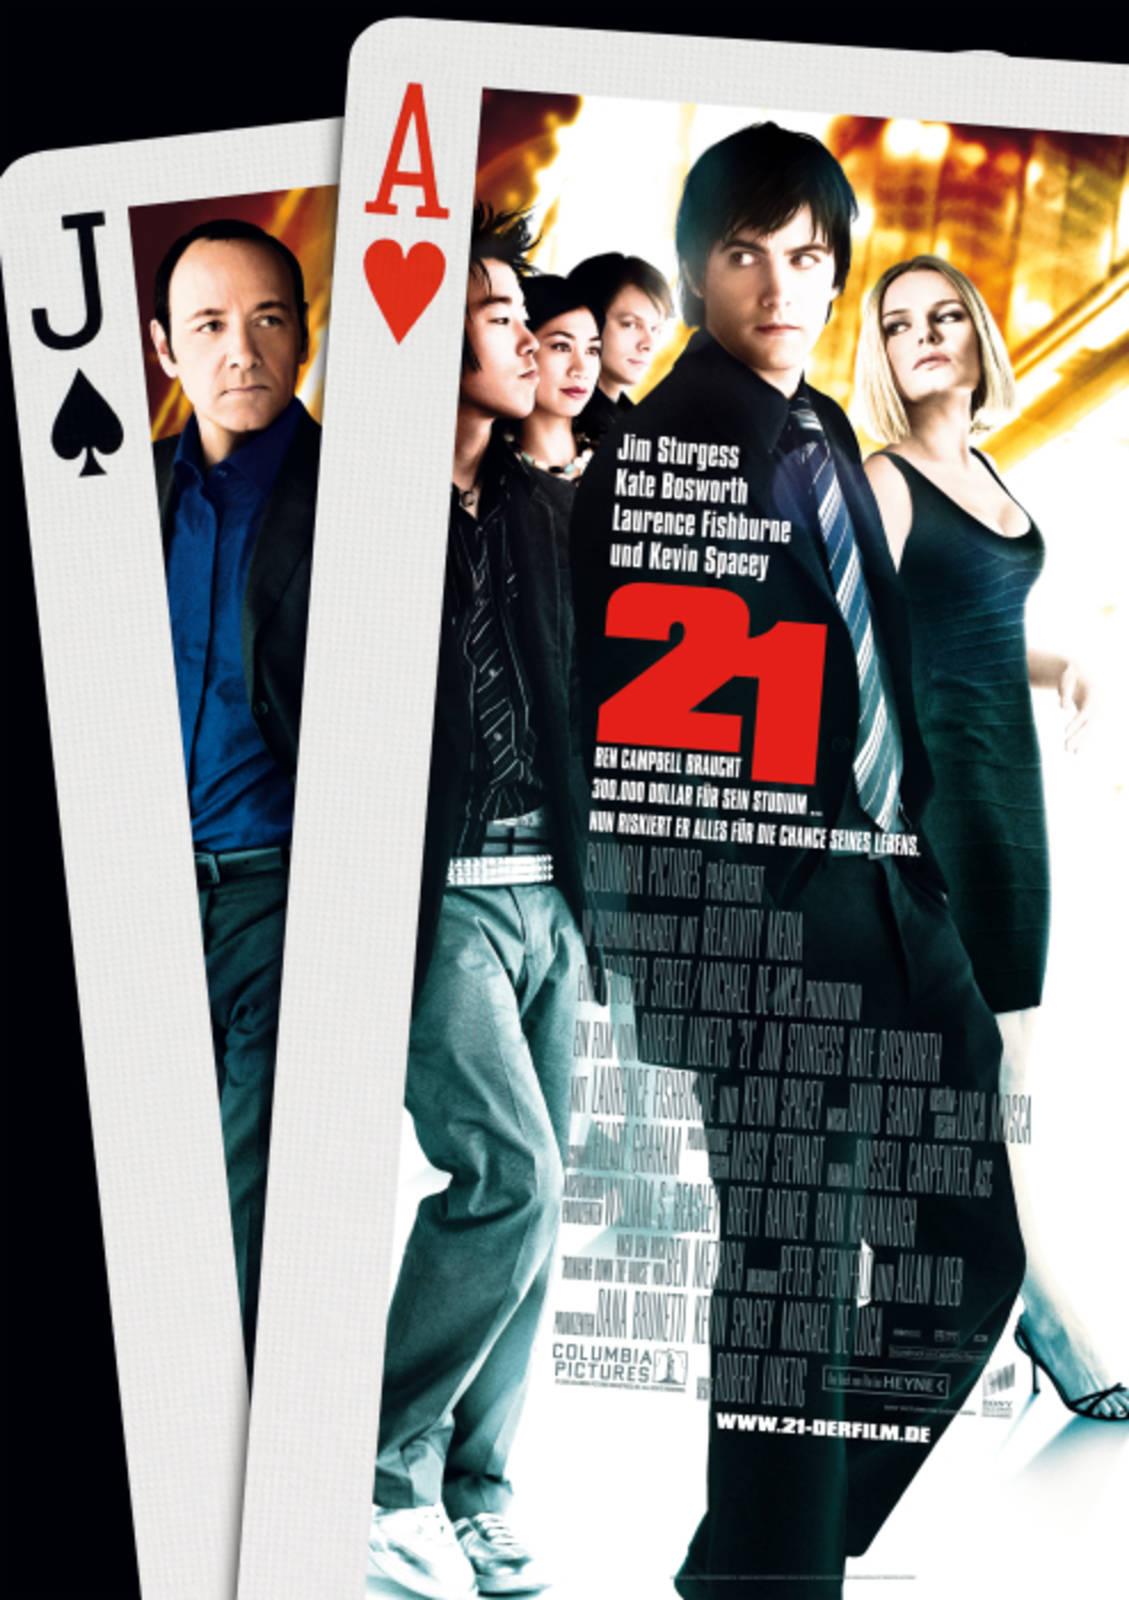 images?q=tbn:ANd9GcQh_l3eQ5xwiPy07kGEXjmjgmBKBRB7H2mRxCGhv1tFWg5c_mWT Trends For Movie 21 @koolgadgetz.com.info